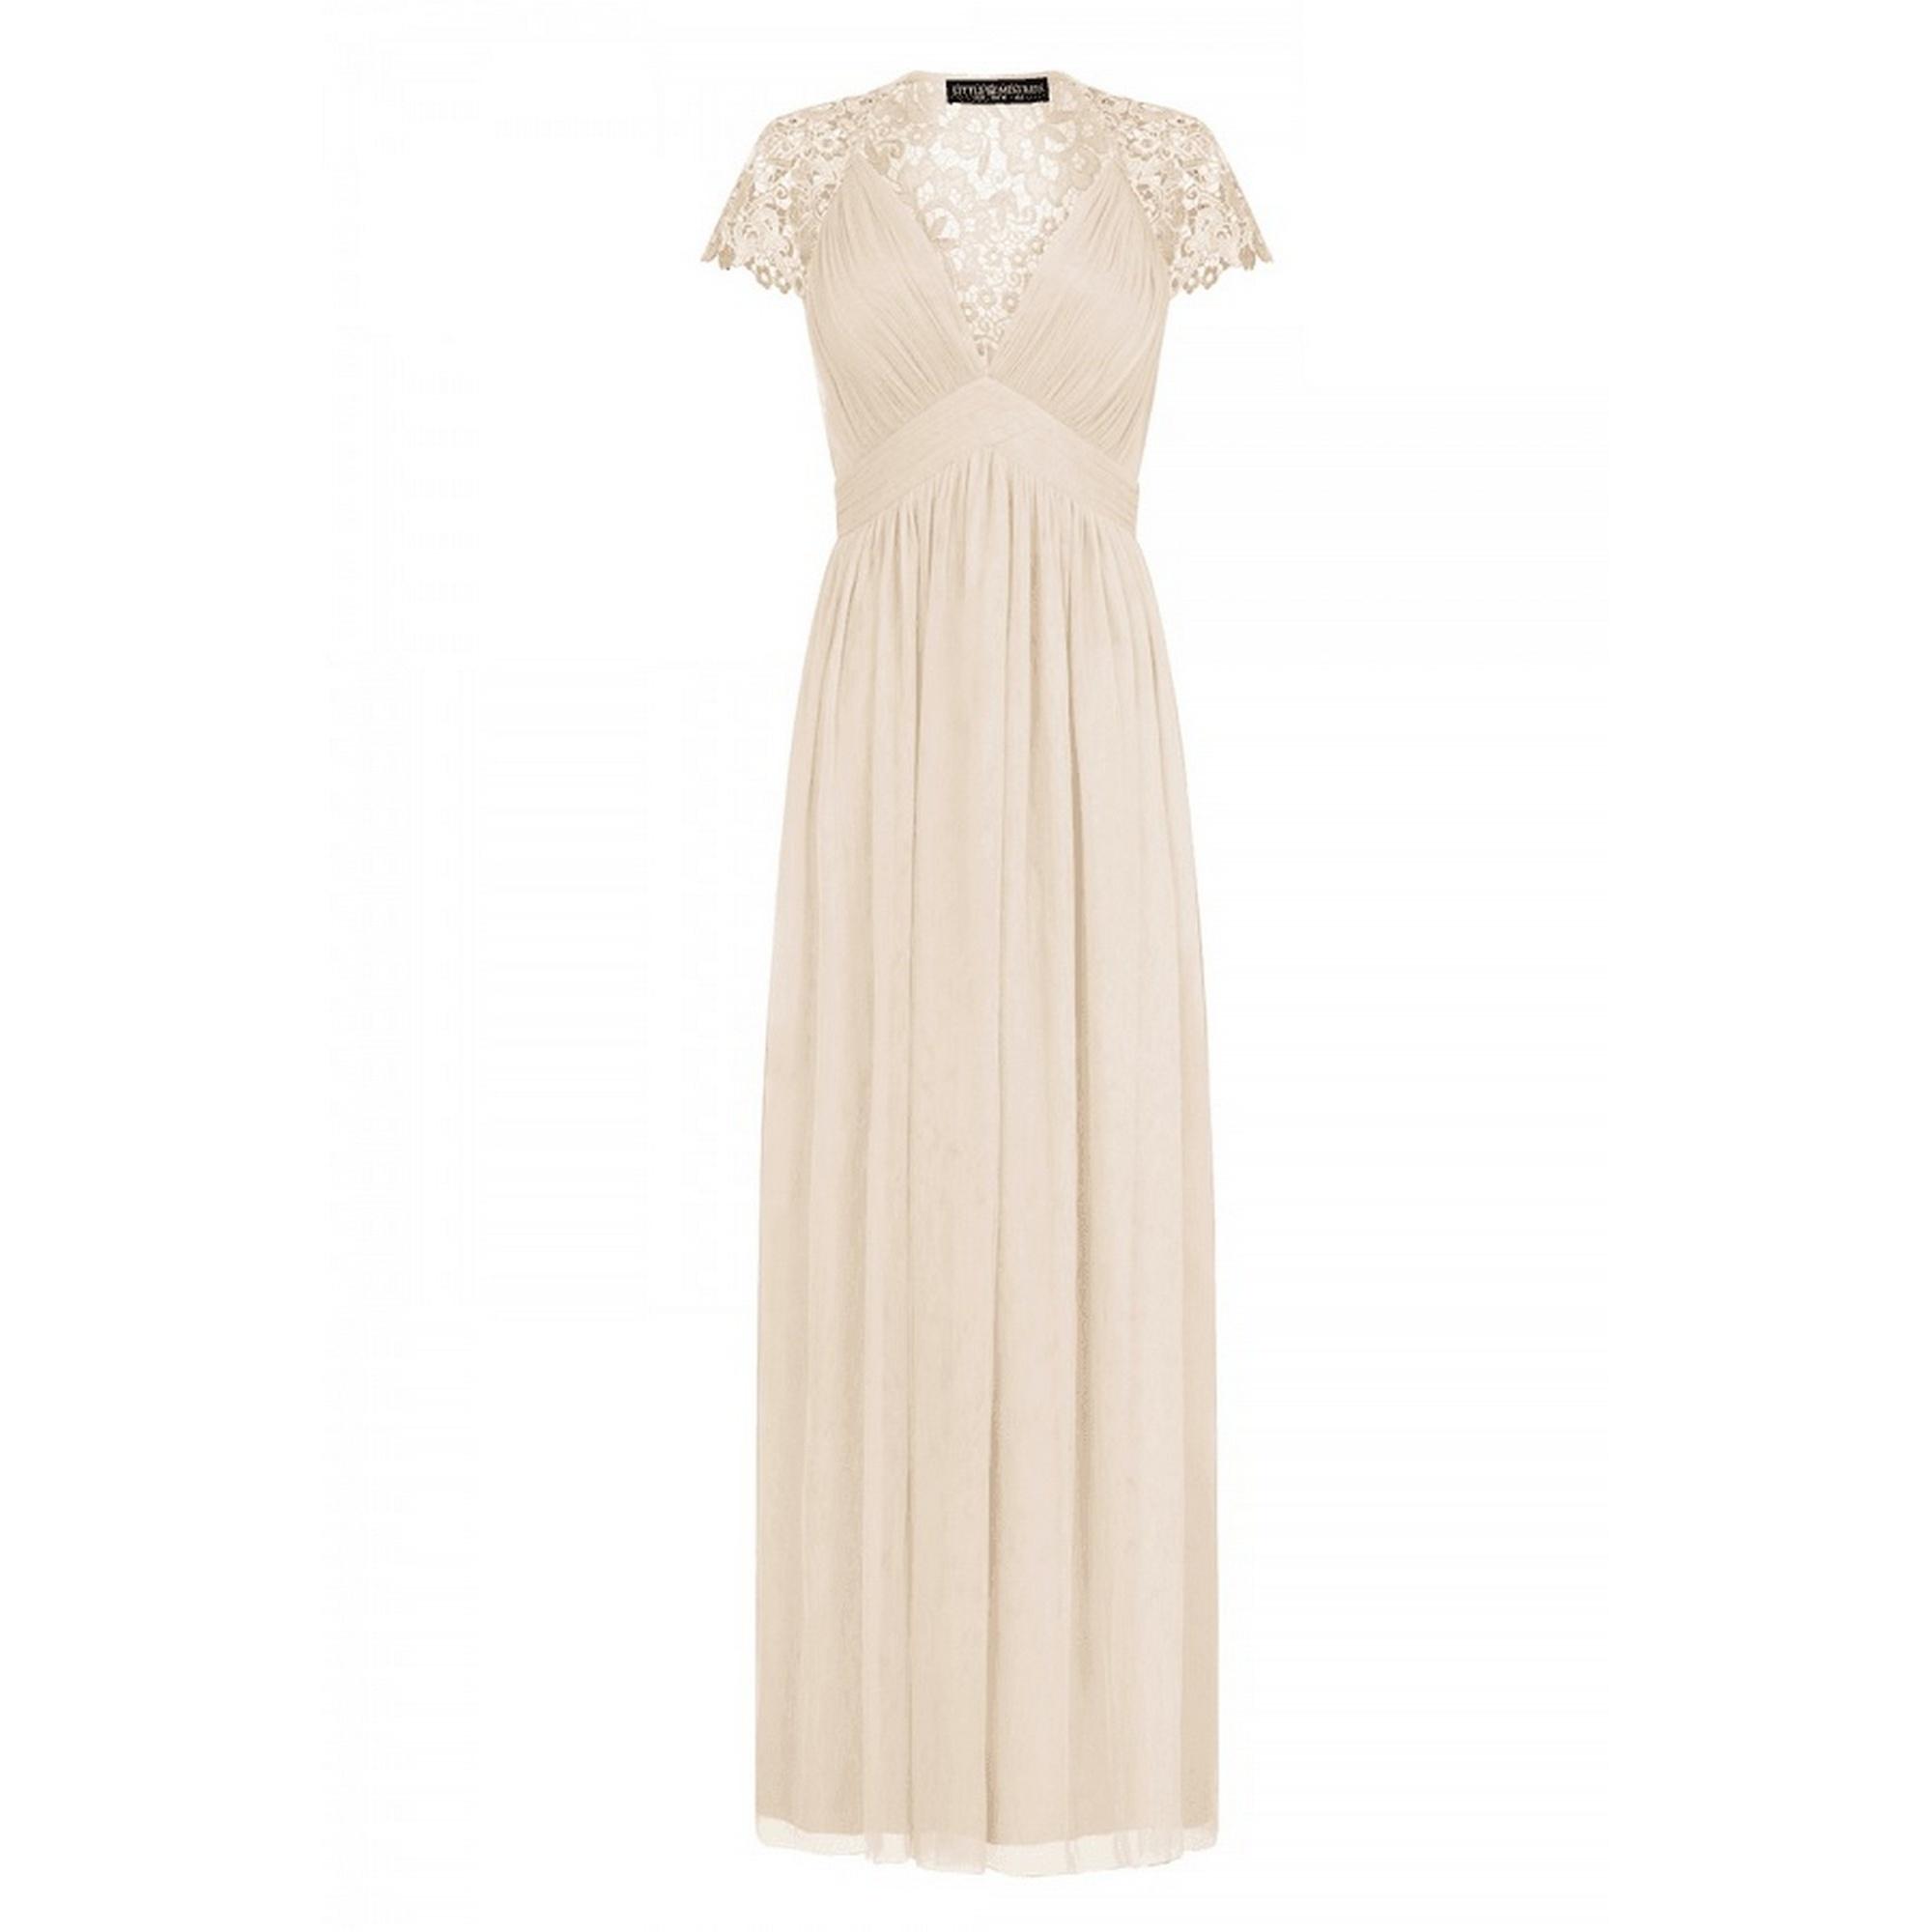 Little Mistress Womens/Ladies Embellished Cap Sleeve Maxi Dress (12 UK) (Nude)